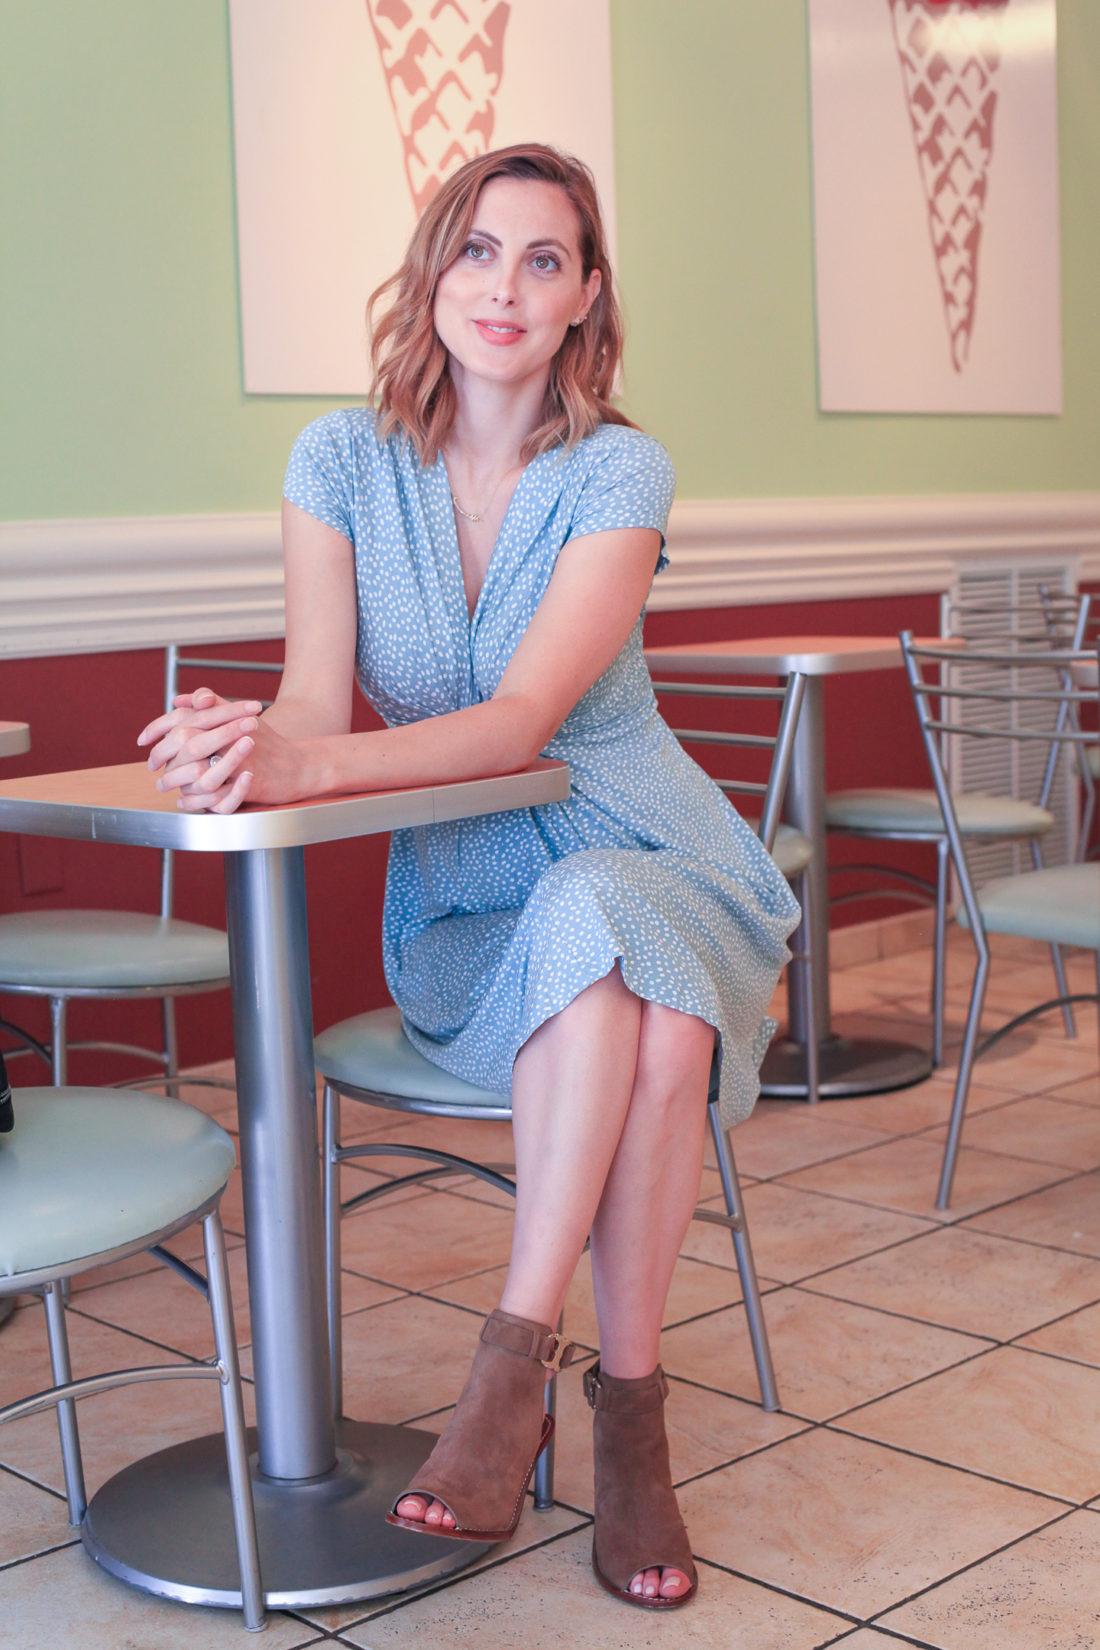 Eva Amurri Martino of Happily Eva After Blog wearing light blue Seraphine Maternity dress and tory burch booties